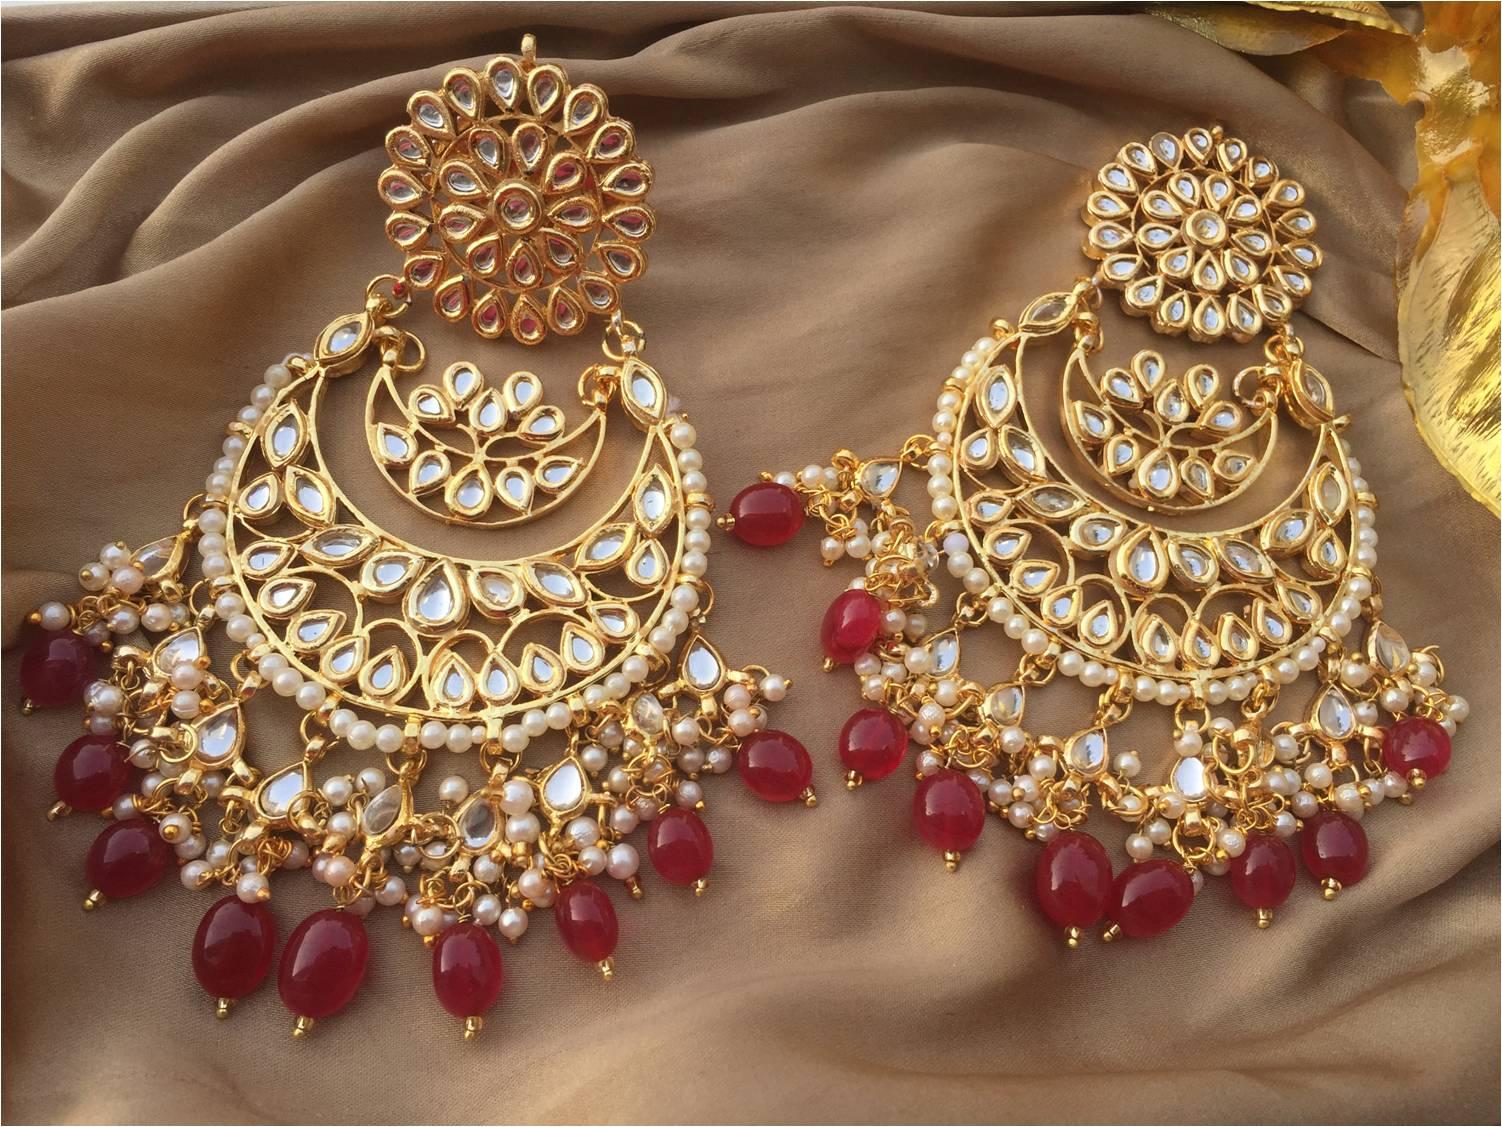 Fashion week Wedding Indian earrings for lady